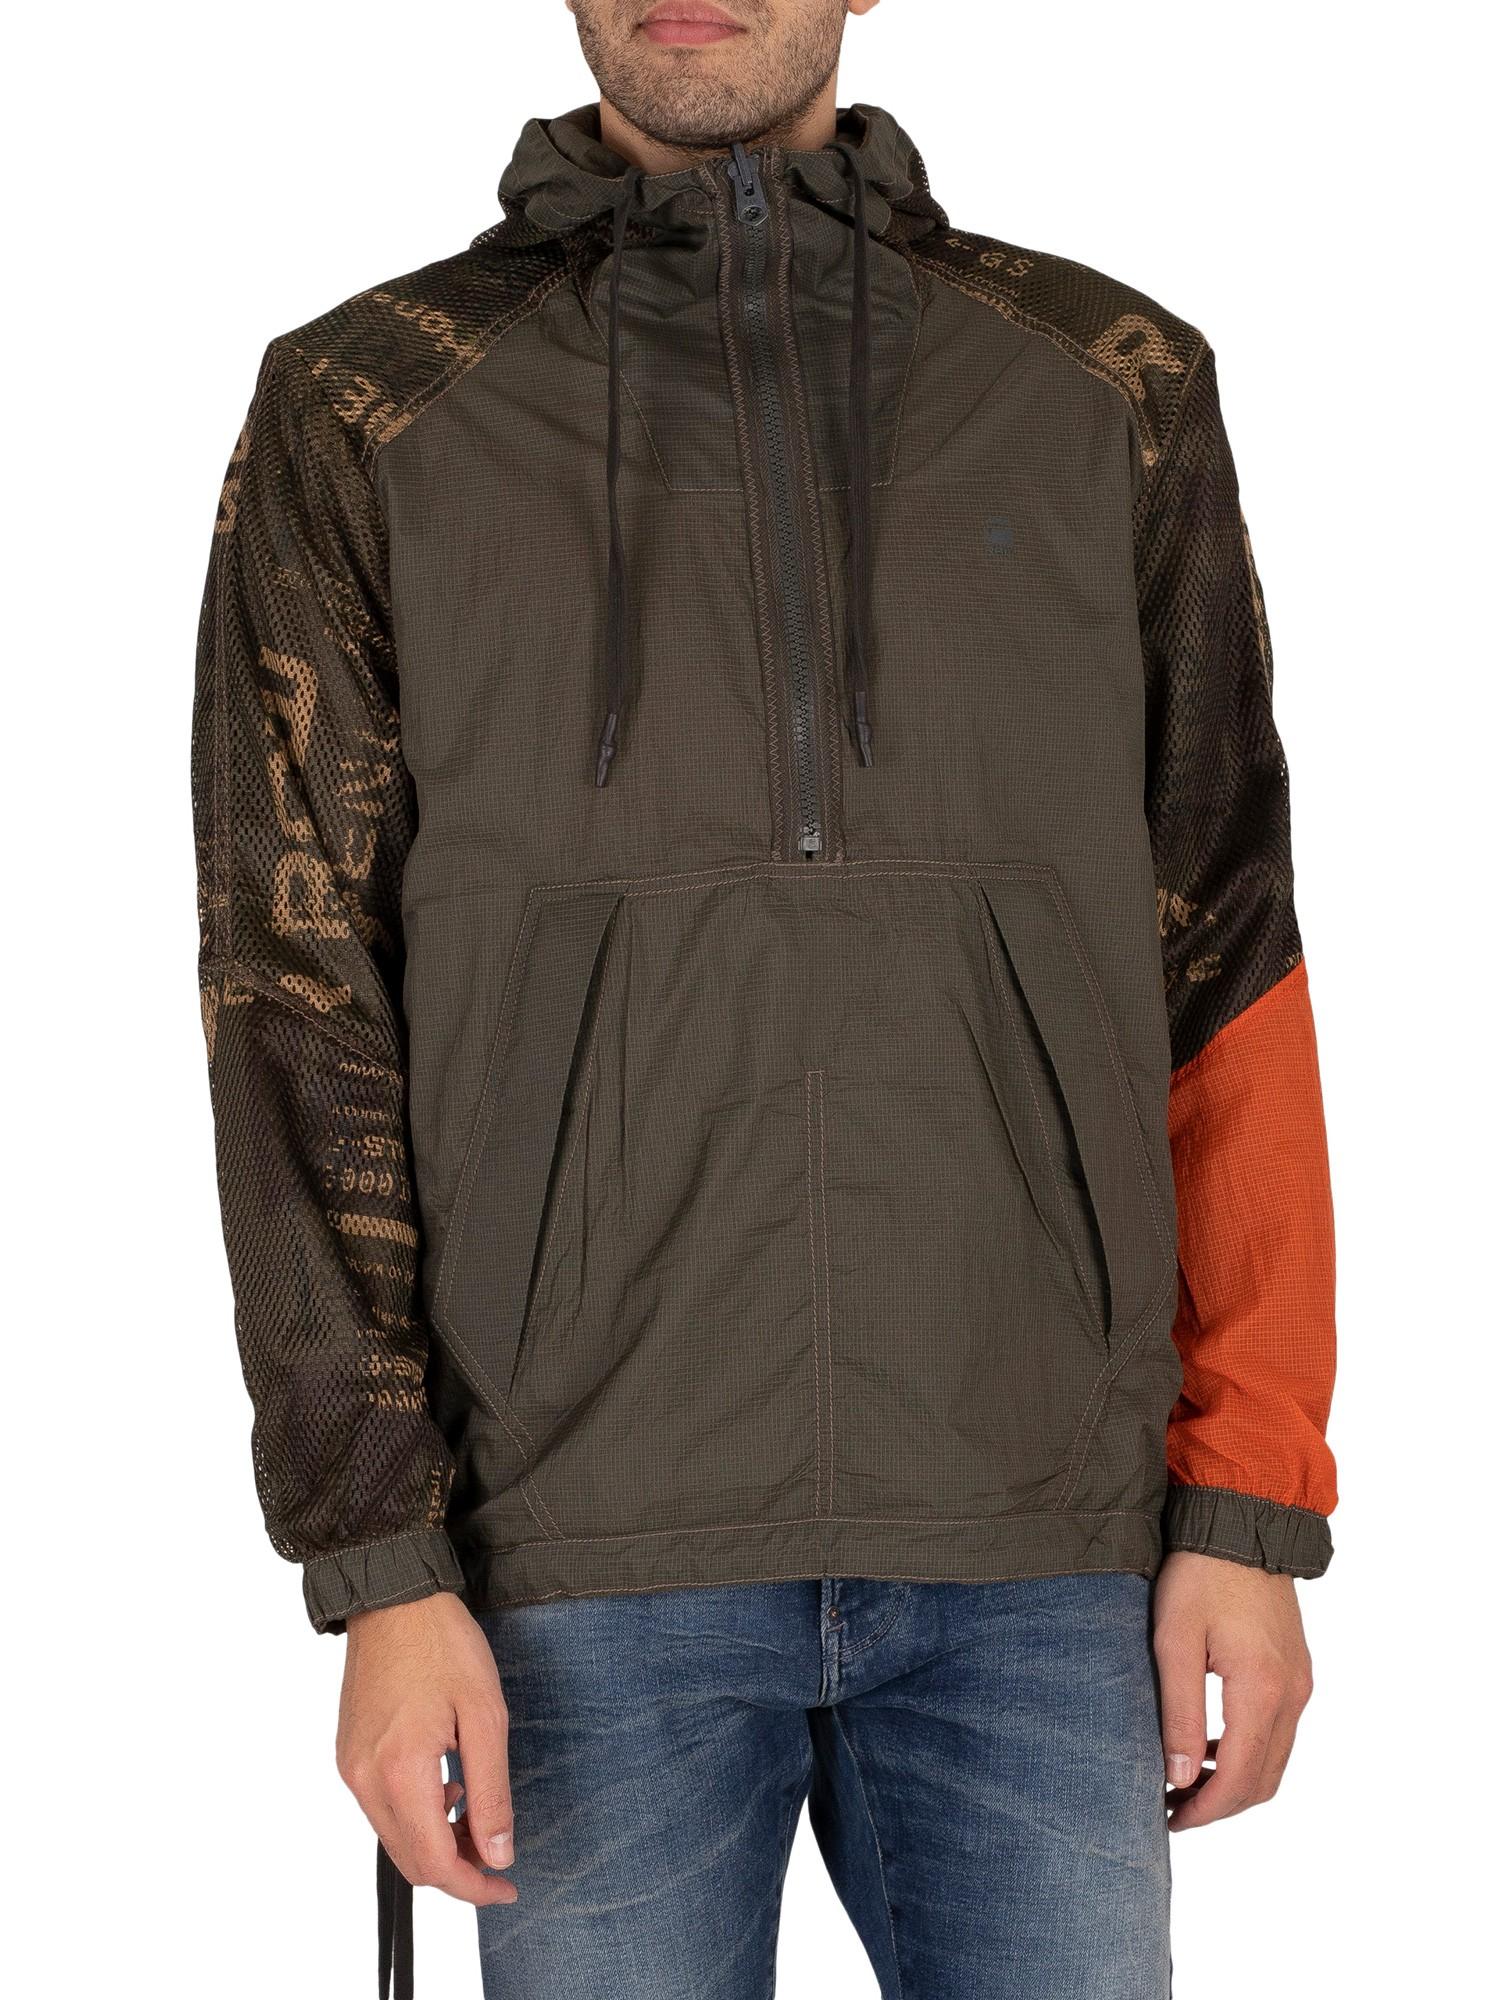 Reversible Anorak Jacket